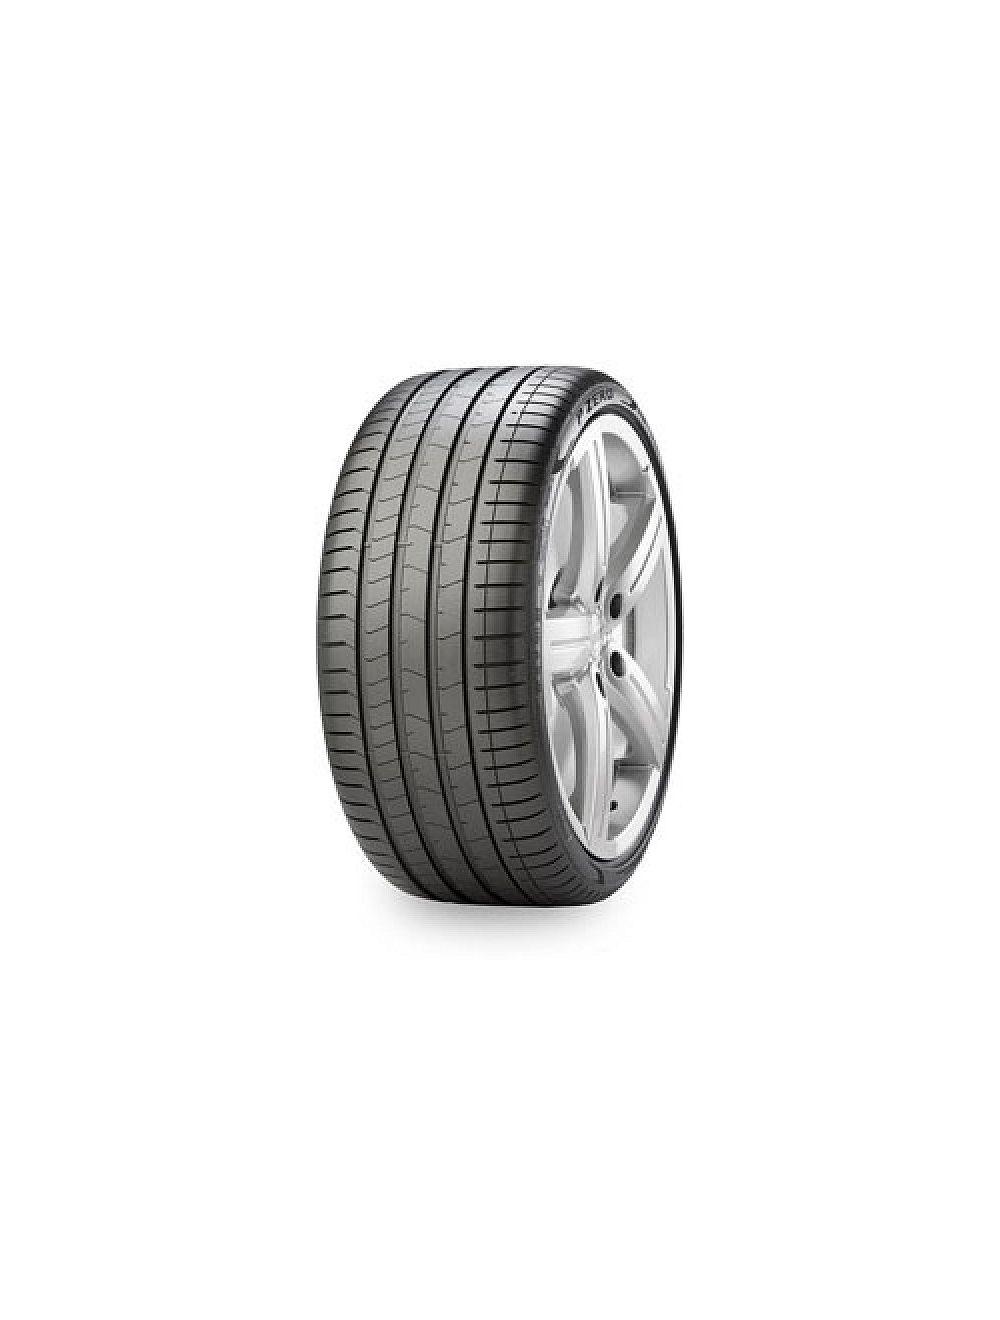 Pirelli 265/40R20 Y P-Zero Luxury XL AO NCS Nyári gumi